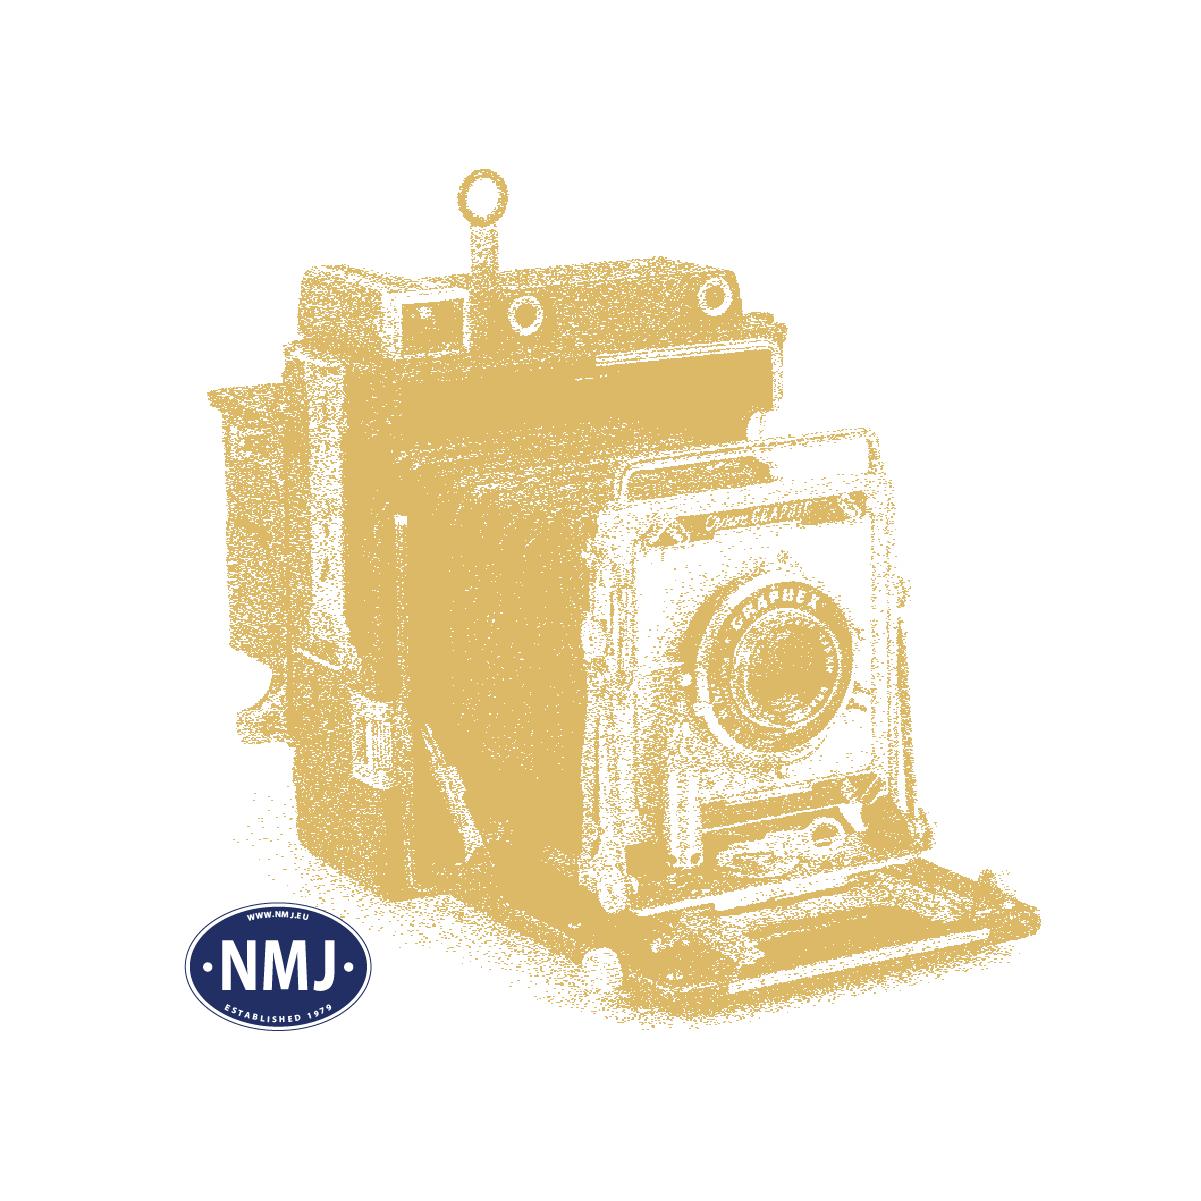 NMJT601.105 - NMJ Topline Modell des Rungenwagens Os 21 74 370 2 102-5 der SJ